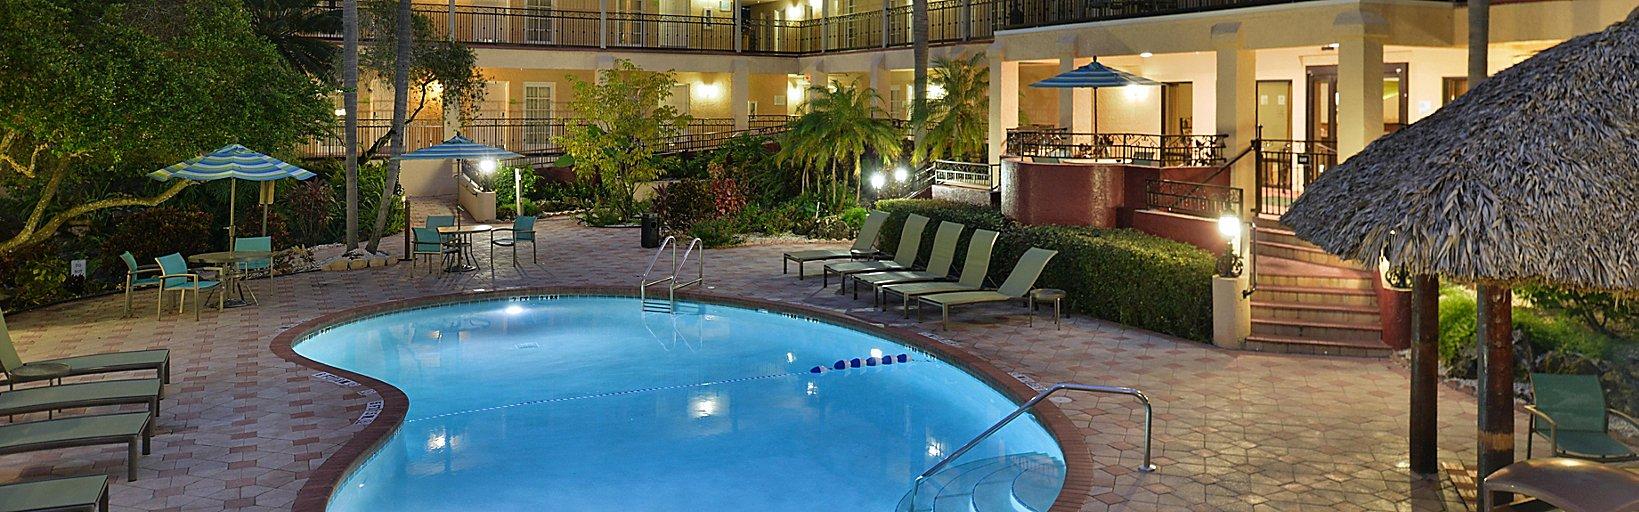 Holiday Inn Hotel & Suites Tampa N - Busch Gardens Area Hotel by IHG